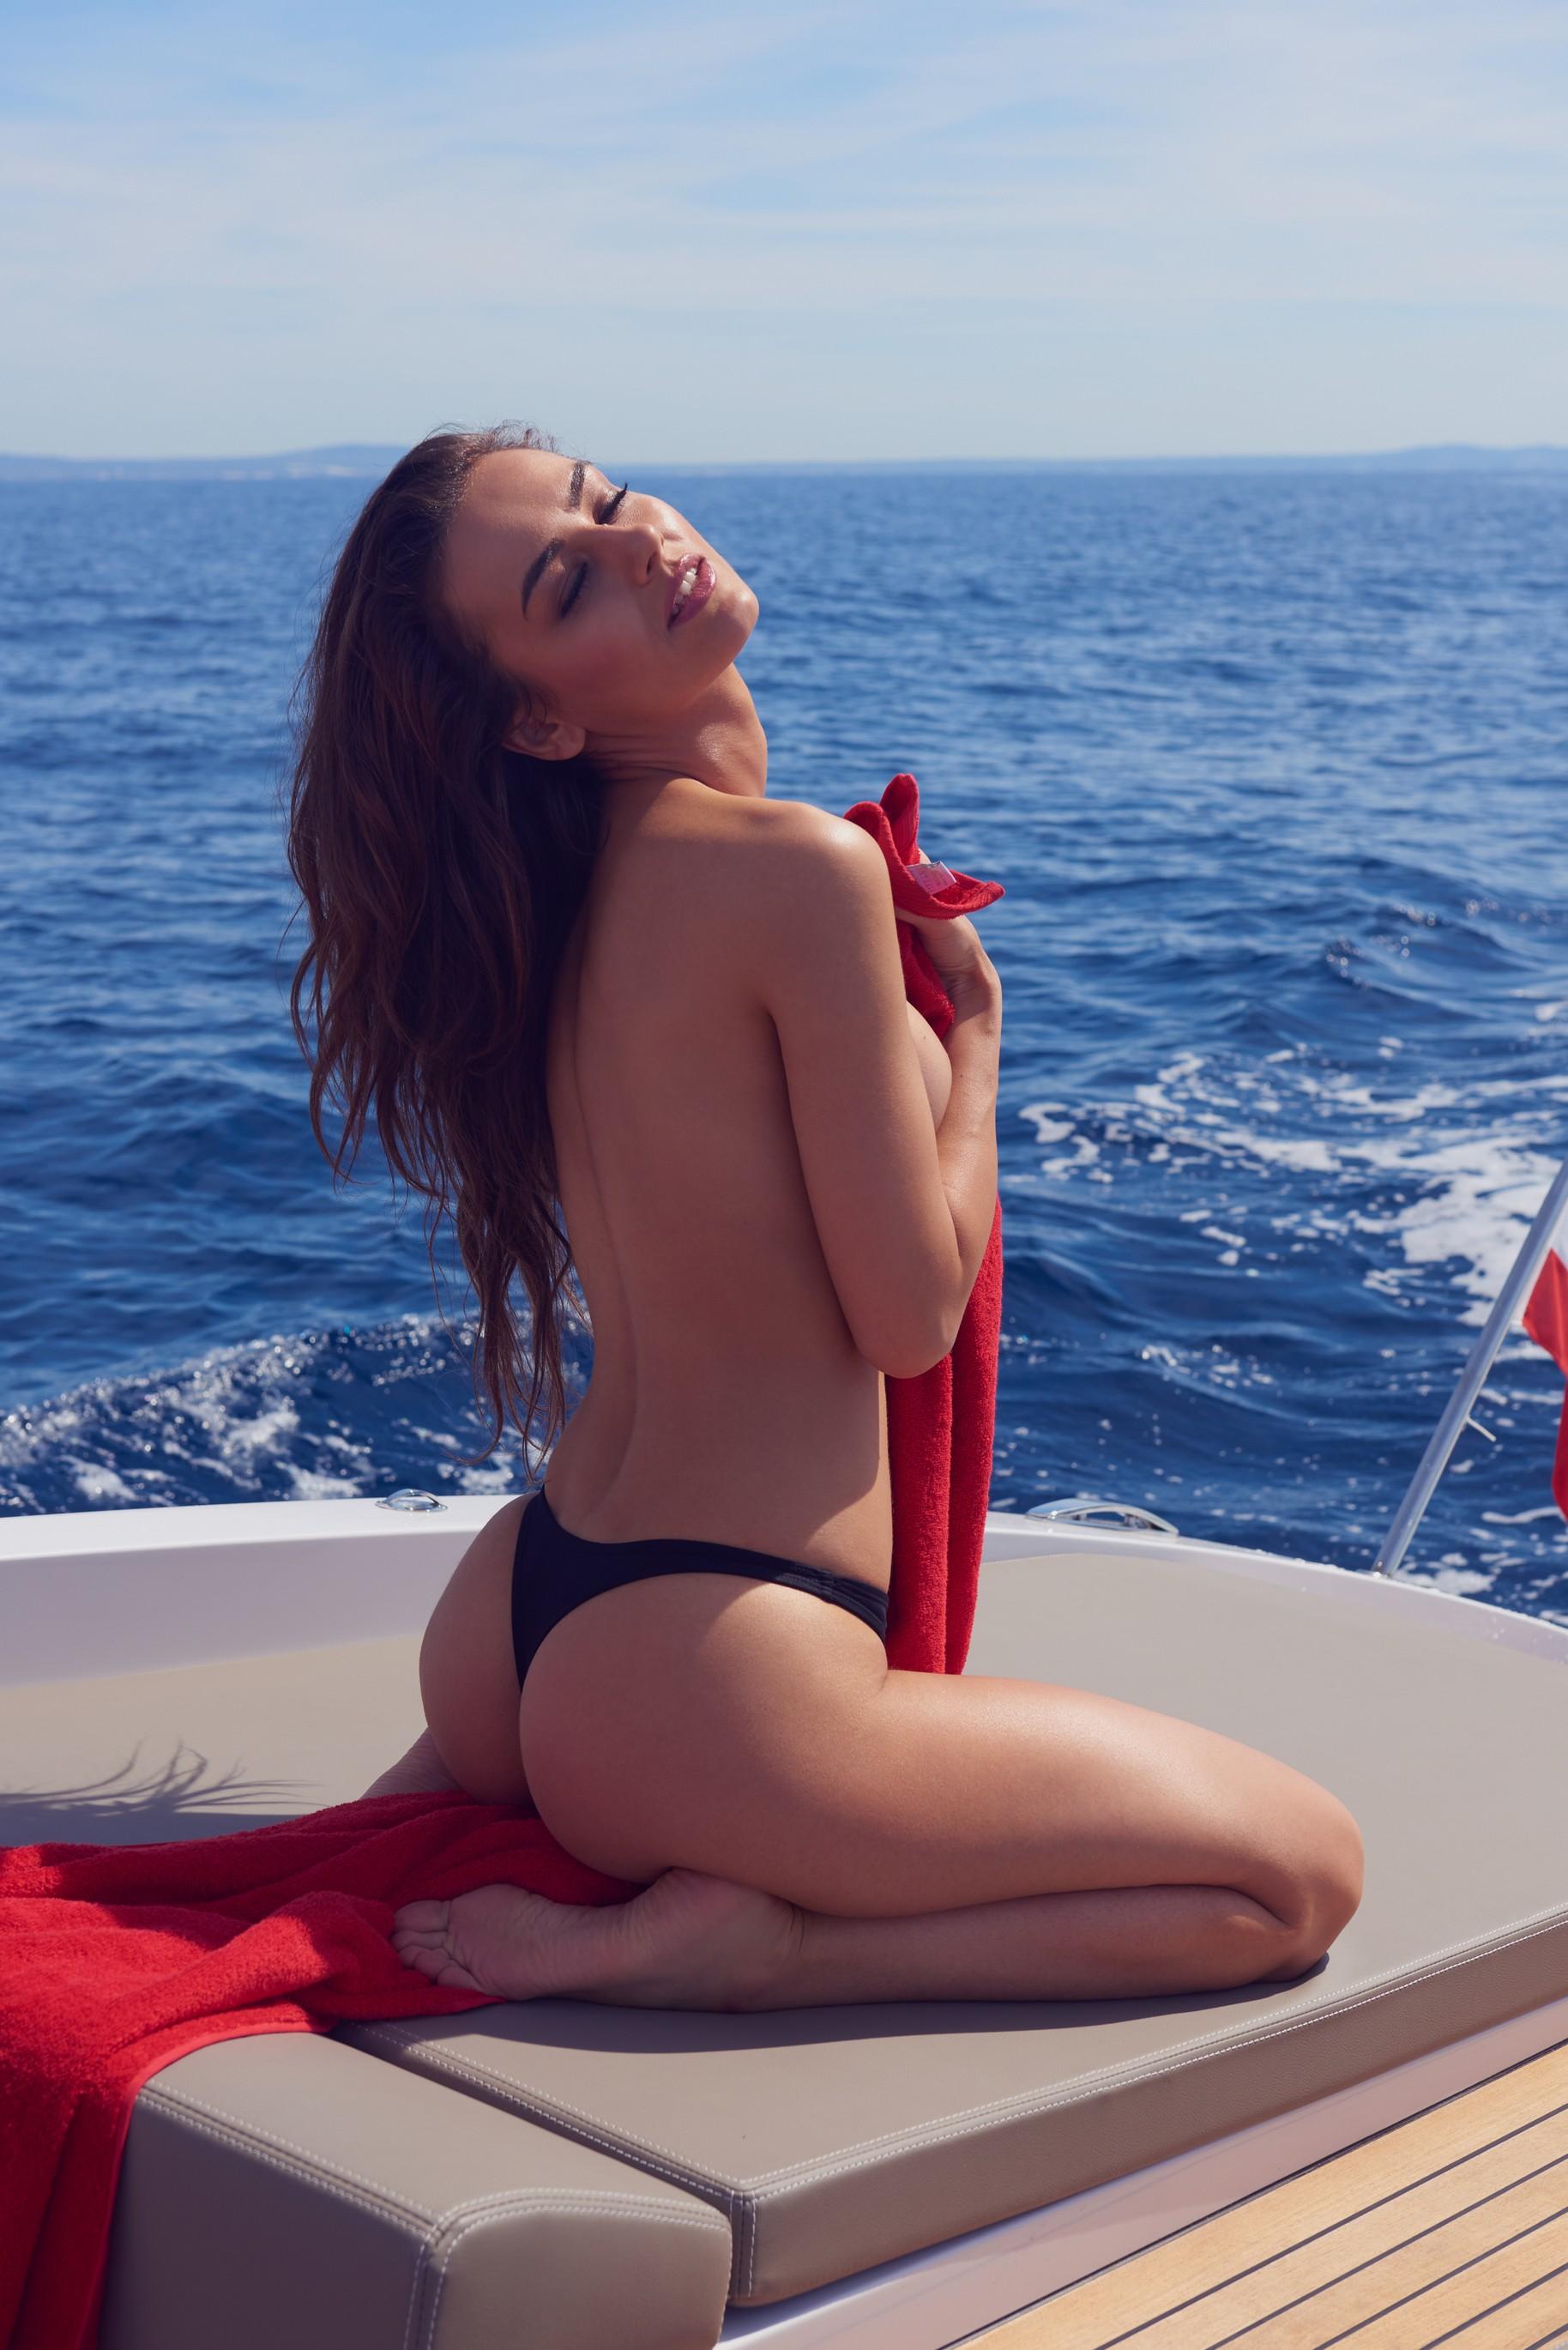 veronika-klimovits-naked-diving-motorboat-seaside-playboy-15